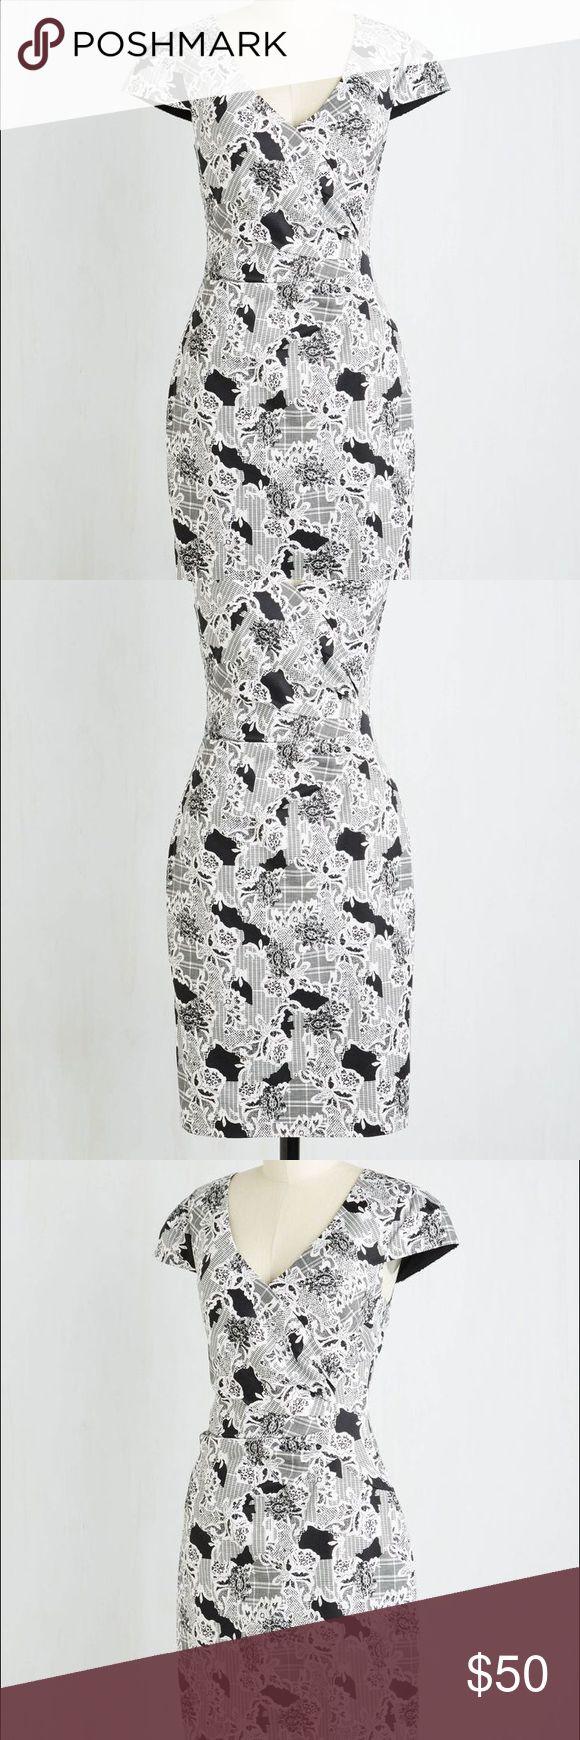 Modcloth Across The Boardroom Sheath Dress NWOT - Size Small ModCloth Dresses Midi